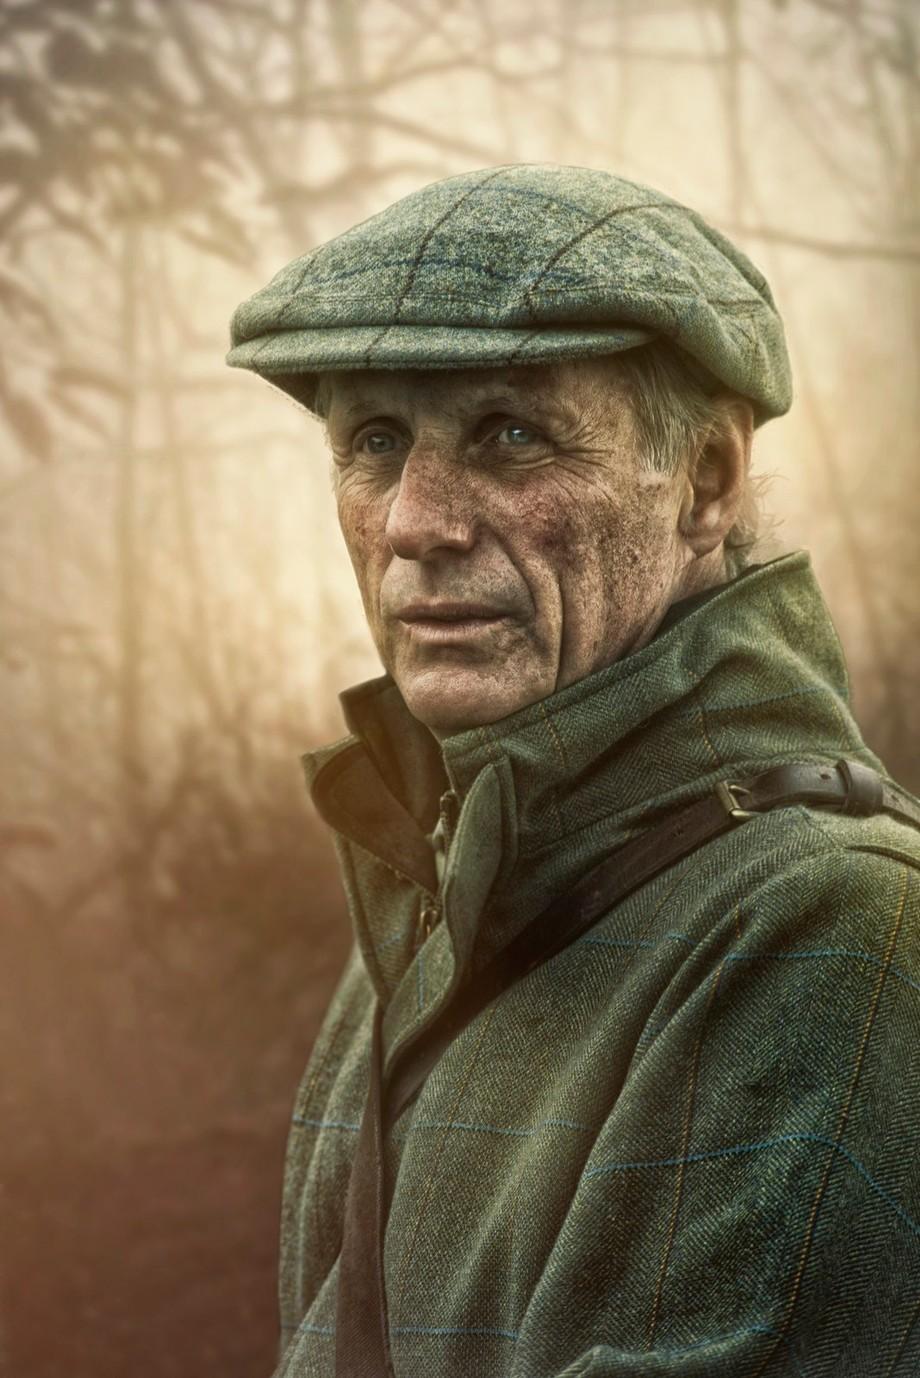 The hunter by morganmarinoni - 500 Dads Photo Contest